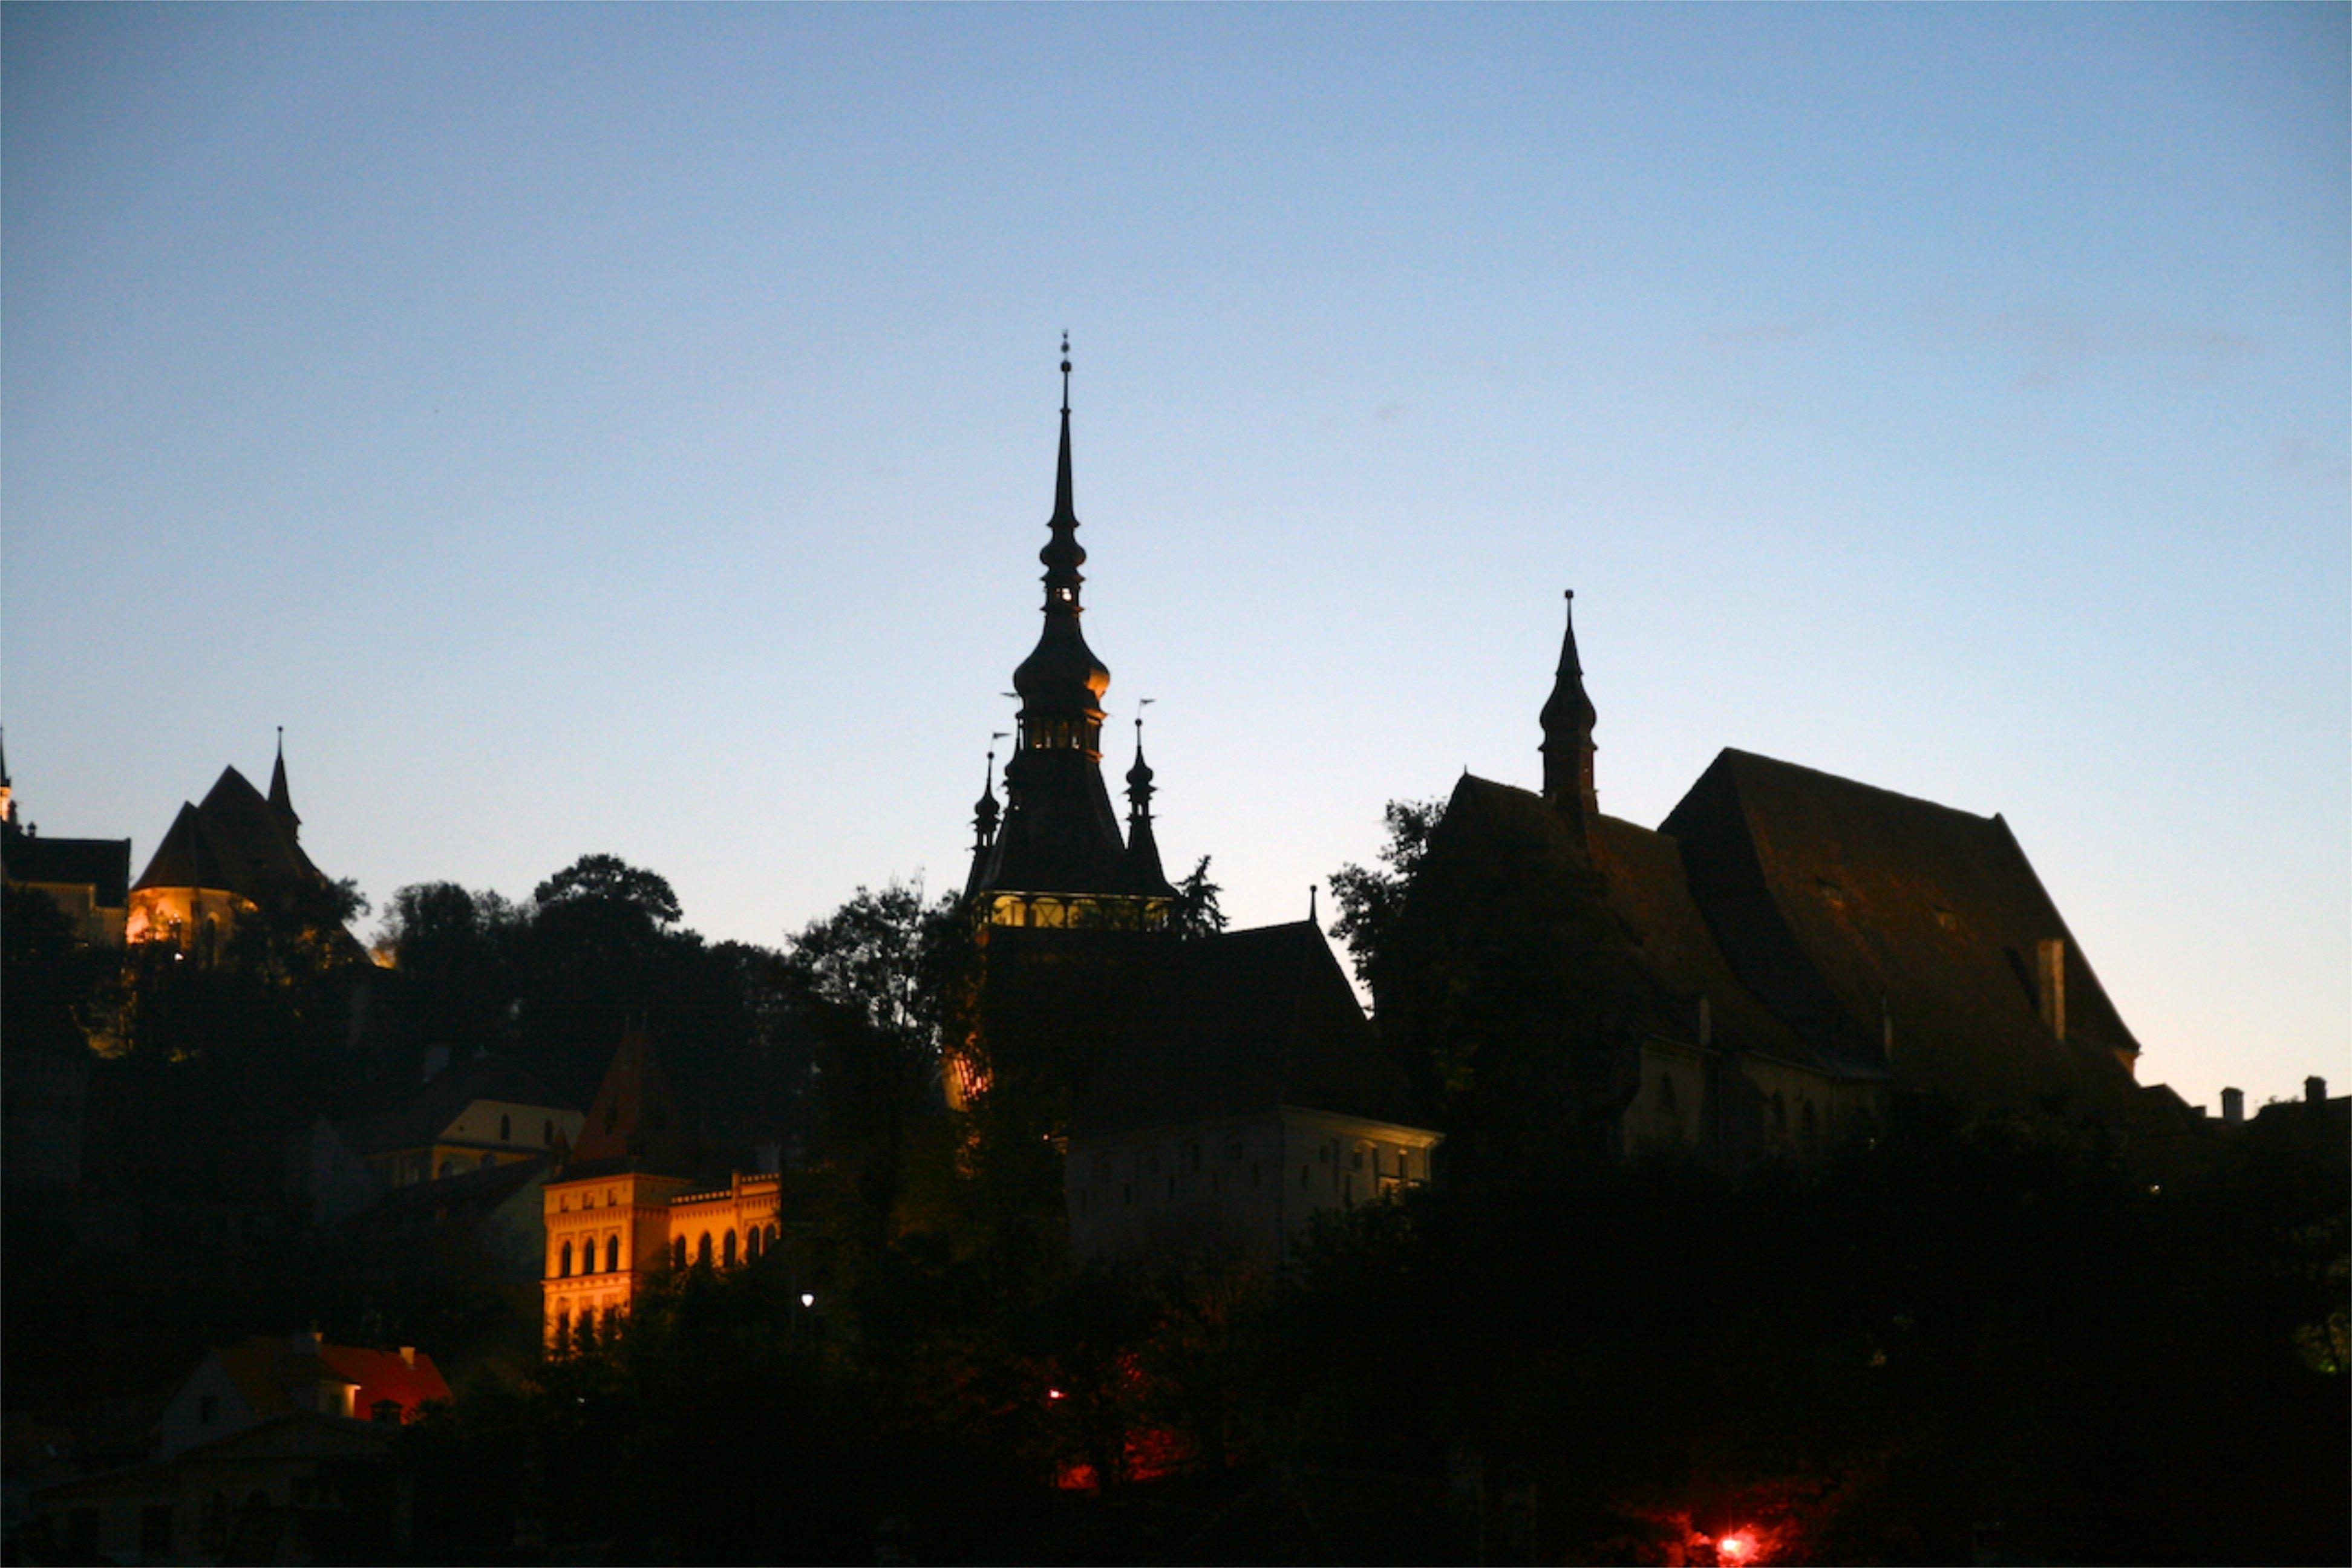 Silhouette Architecture Sky Sunset Skyline Night City Cityscape Dusk Evening Orange Tower Castle Landmark Church Black